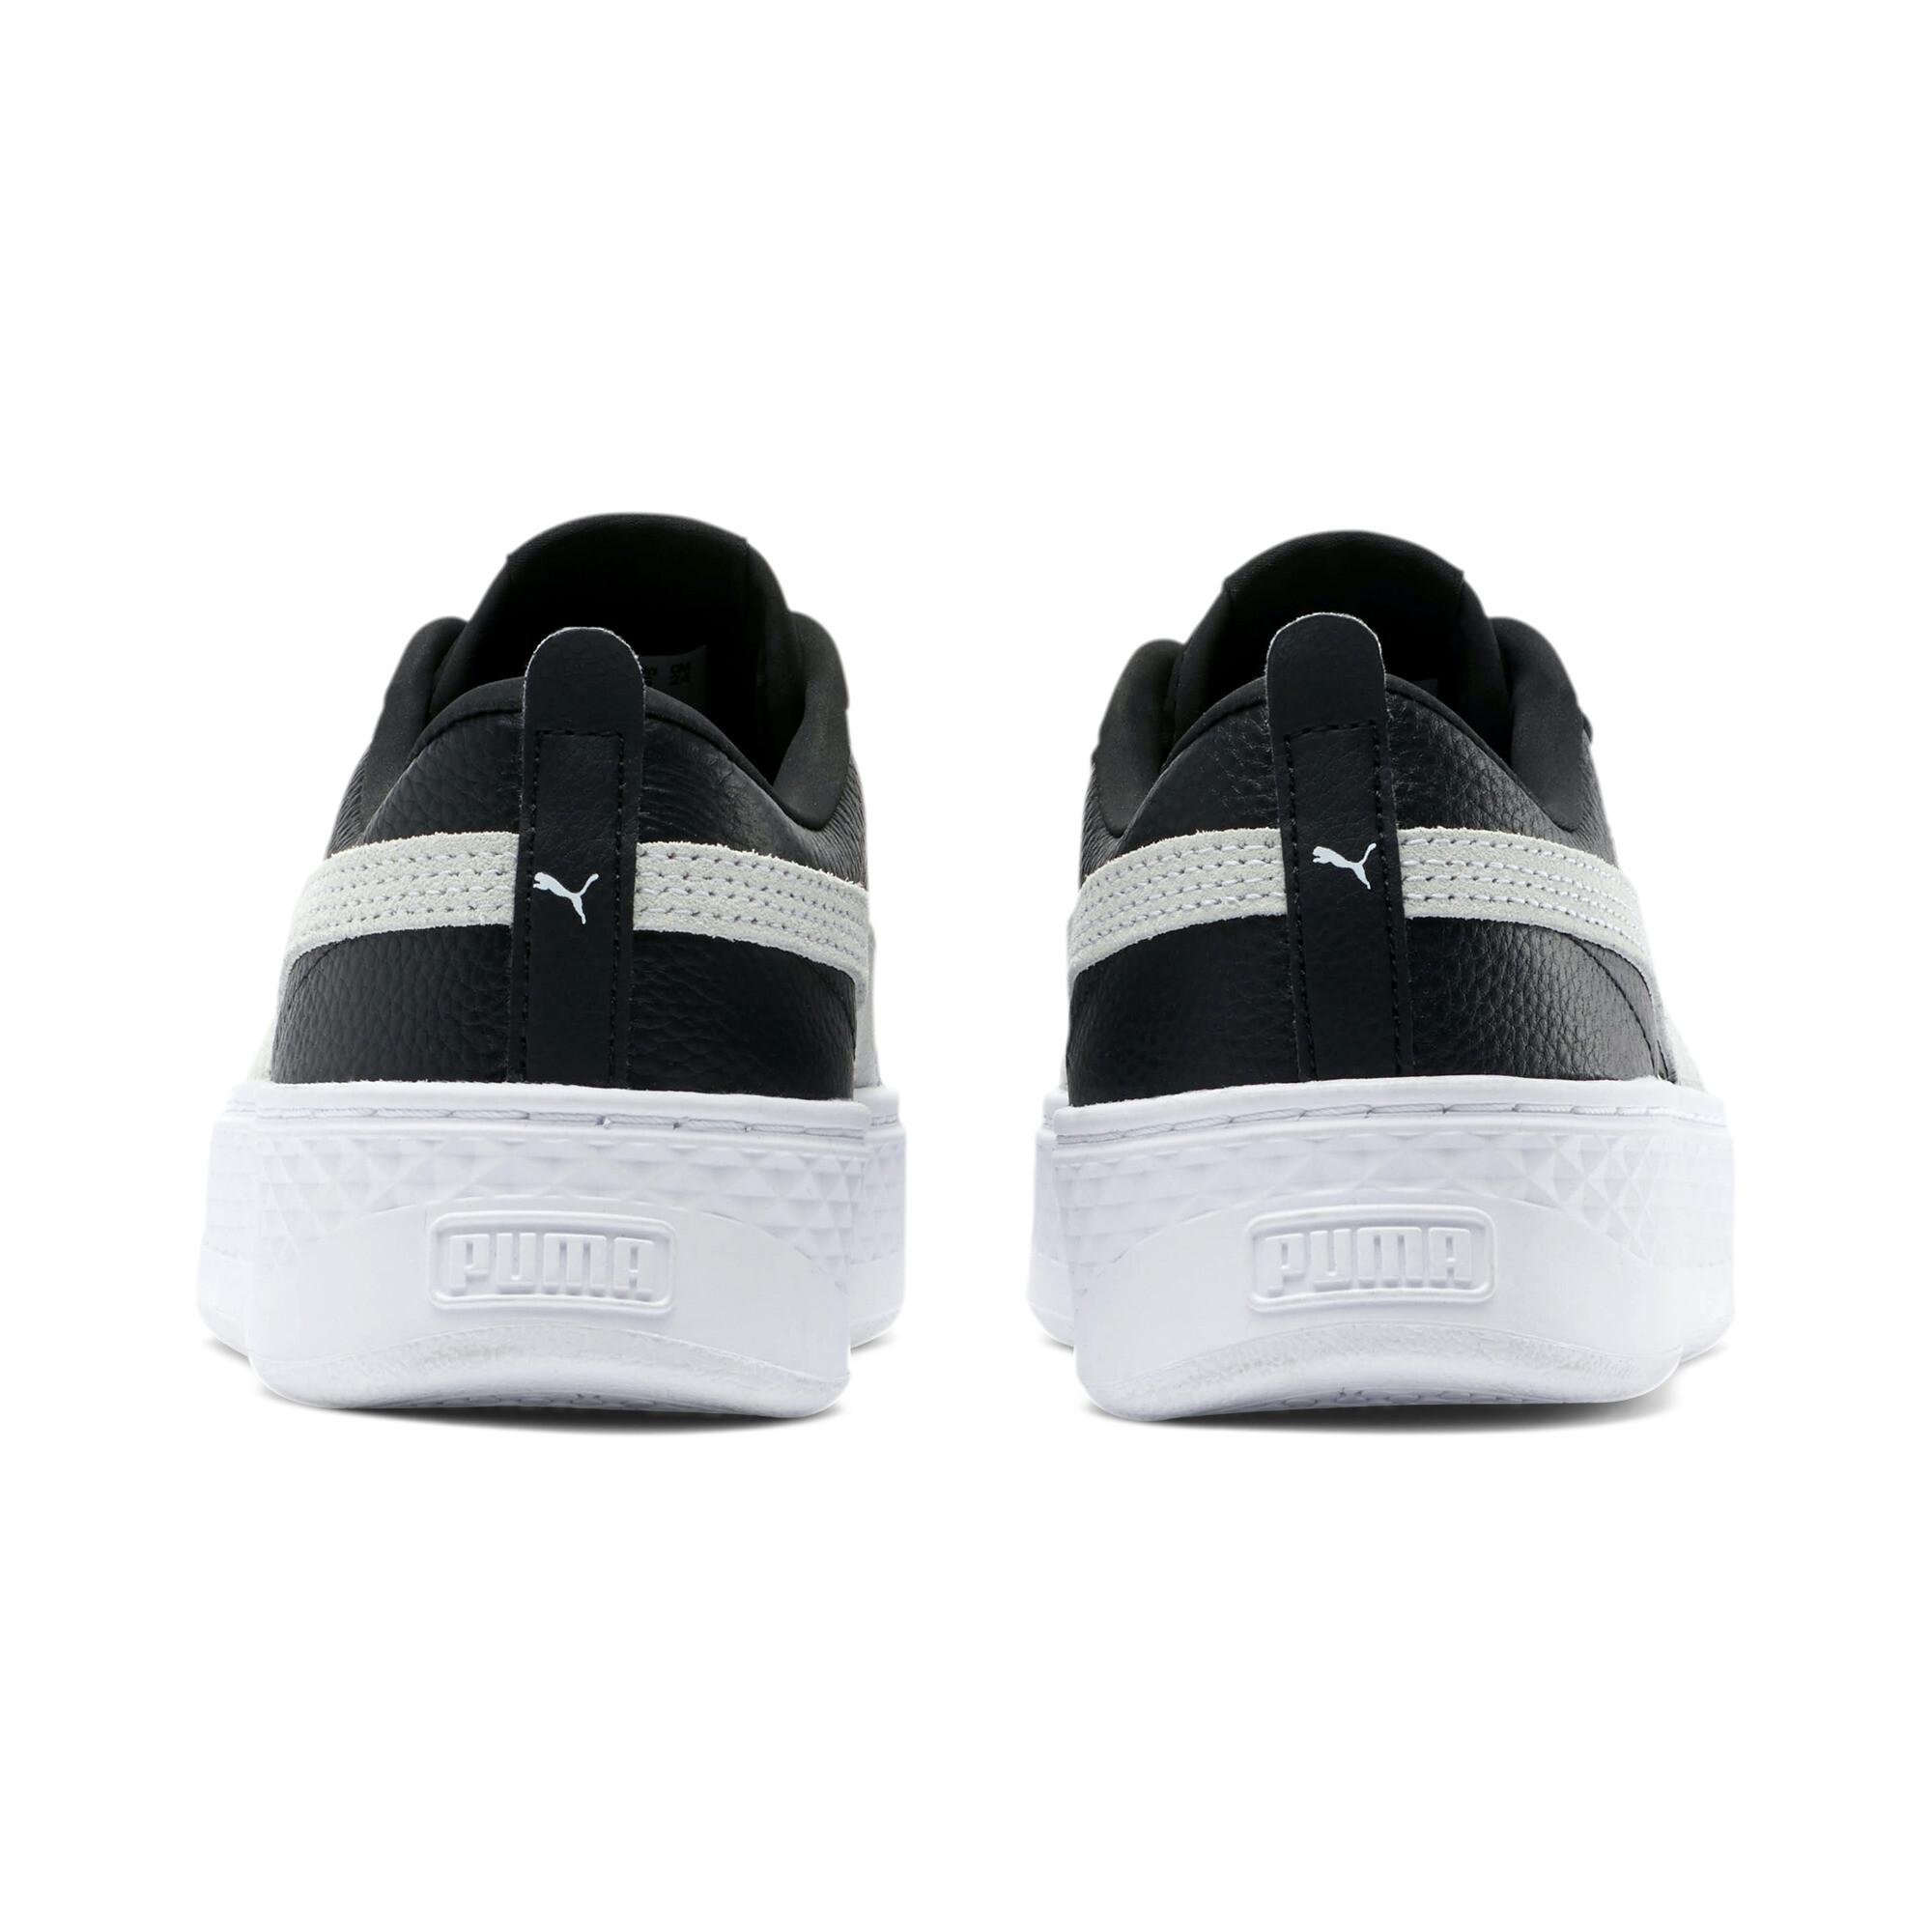 PUMA-Smash-Platform-Leather-Women-039-s-Sneakers-Women-Shoe-Basics thumbnail 18